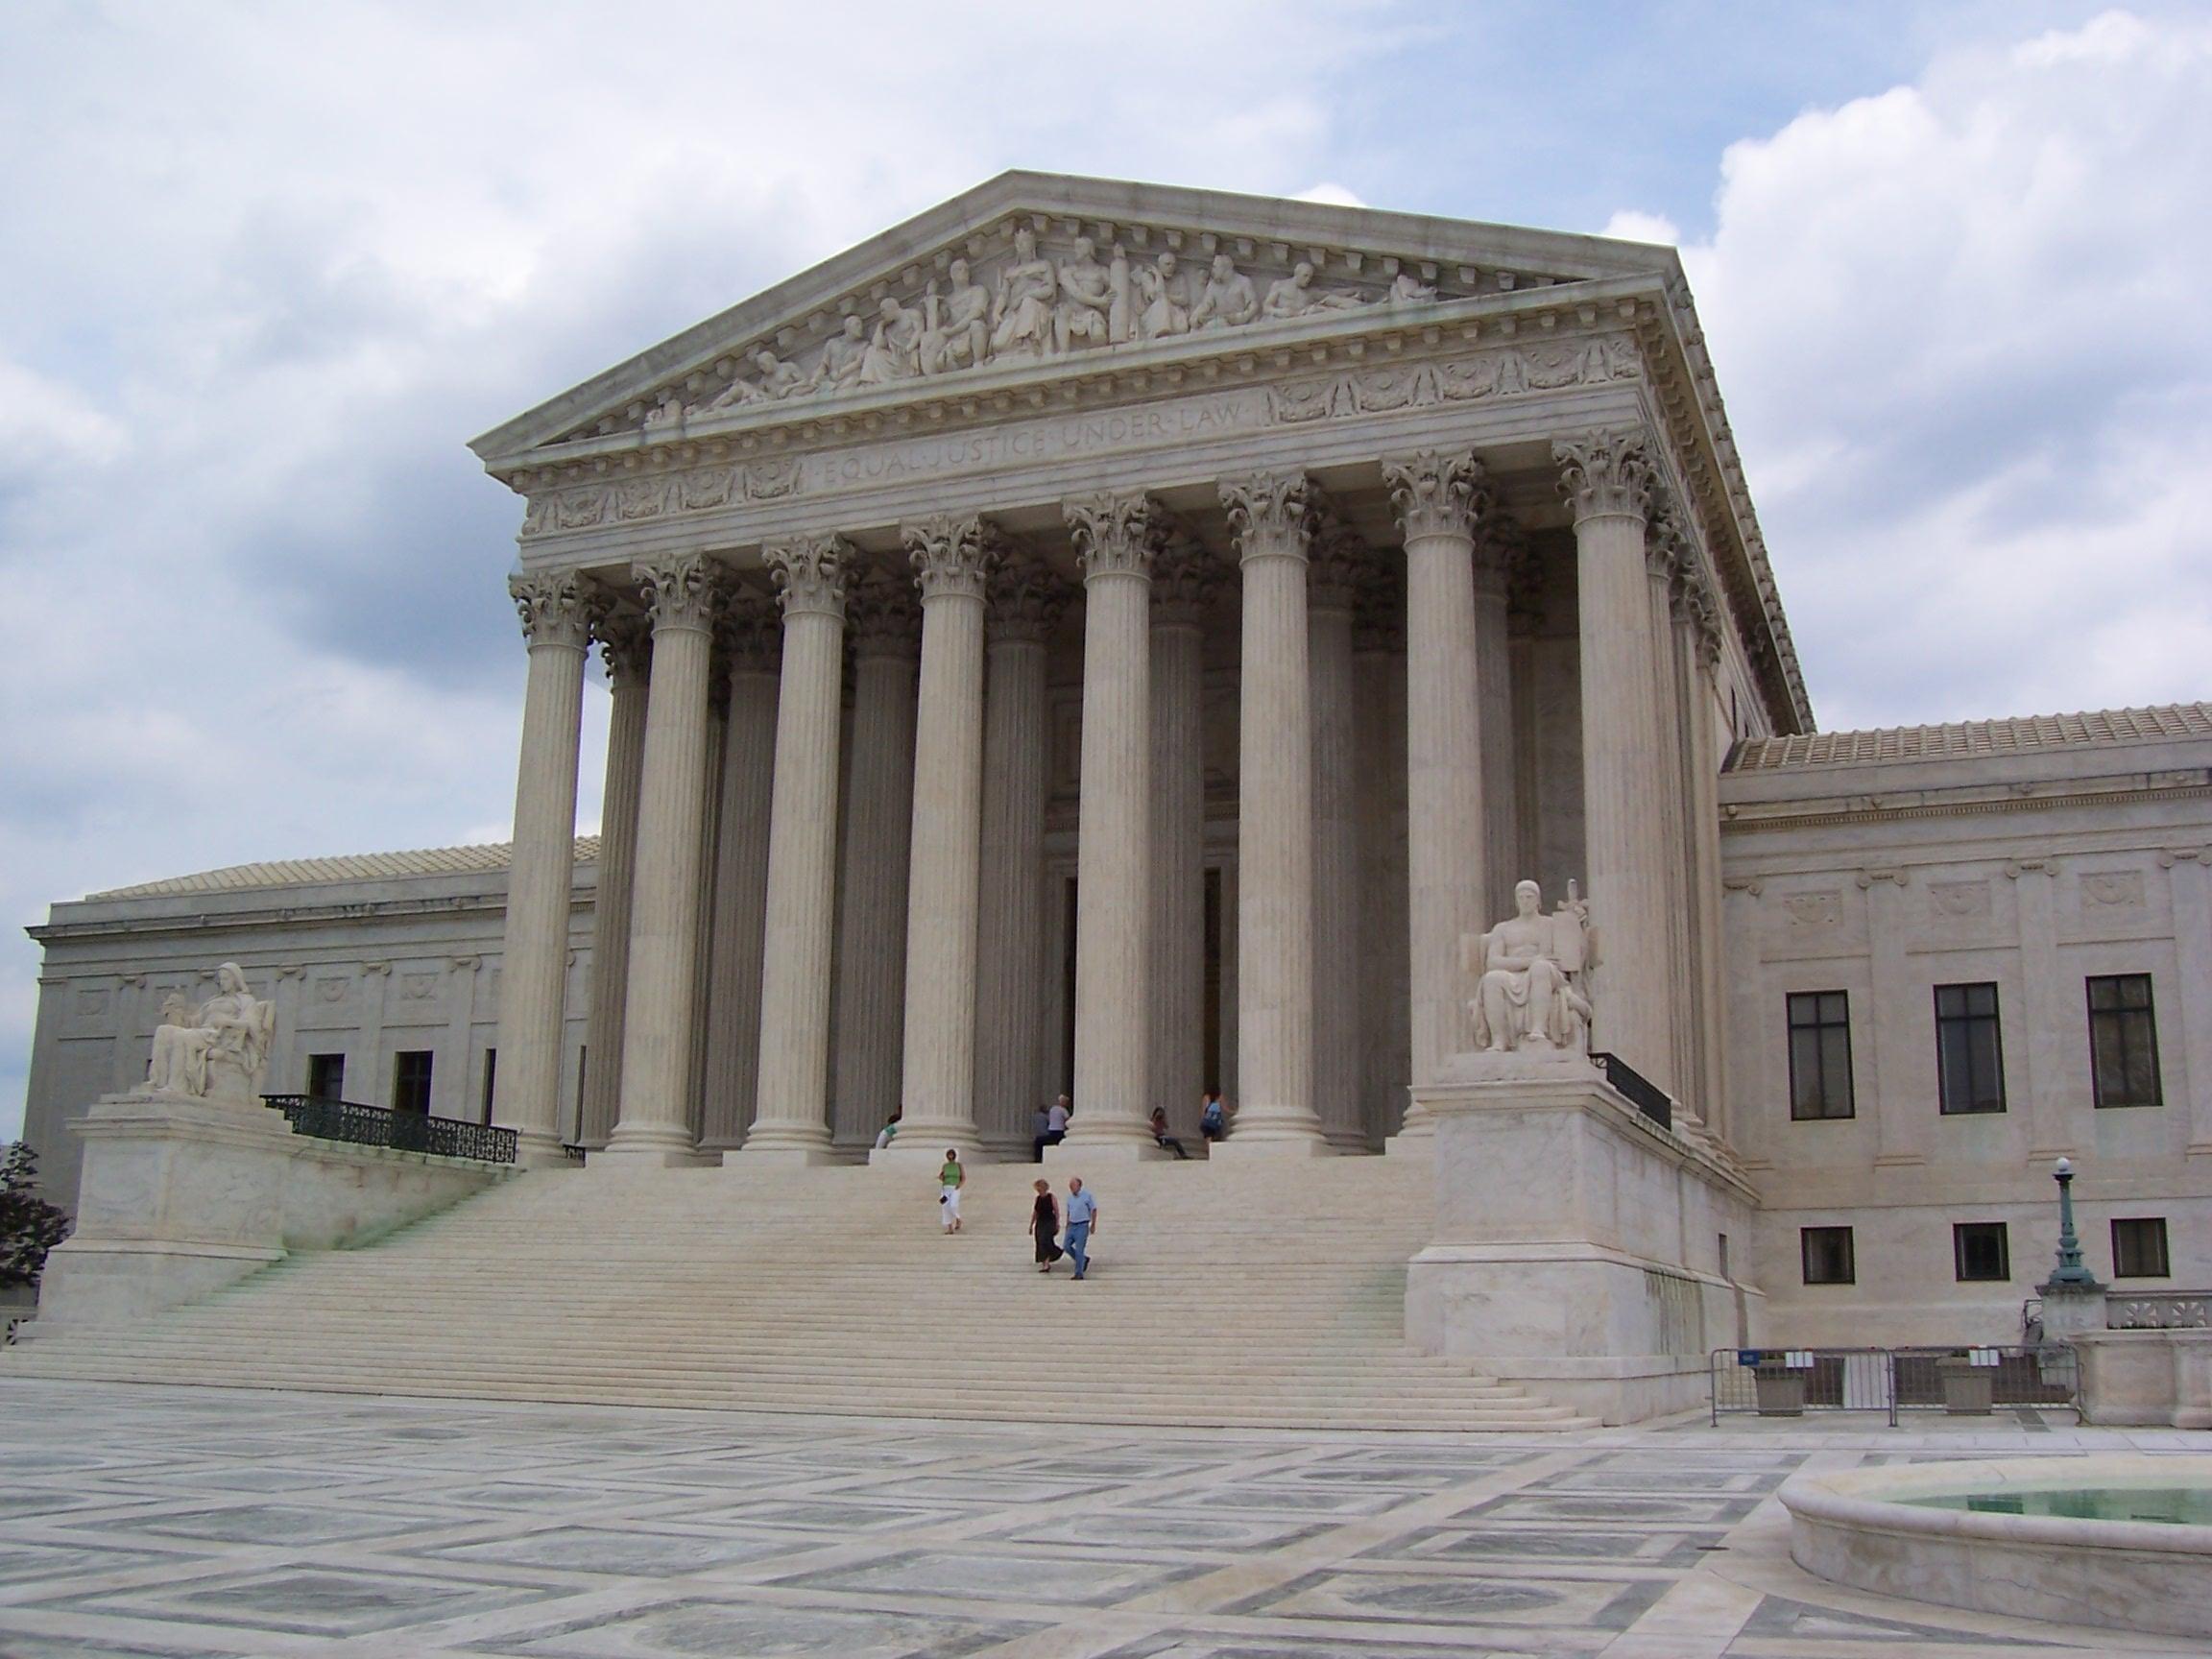 Fair Courts E Lert Opinion Politicization Risks Judicial